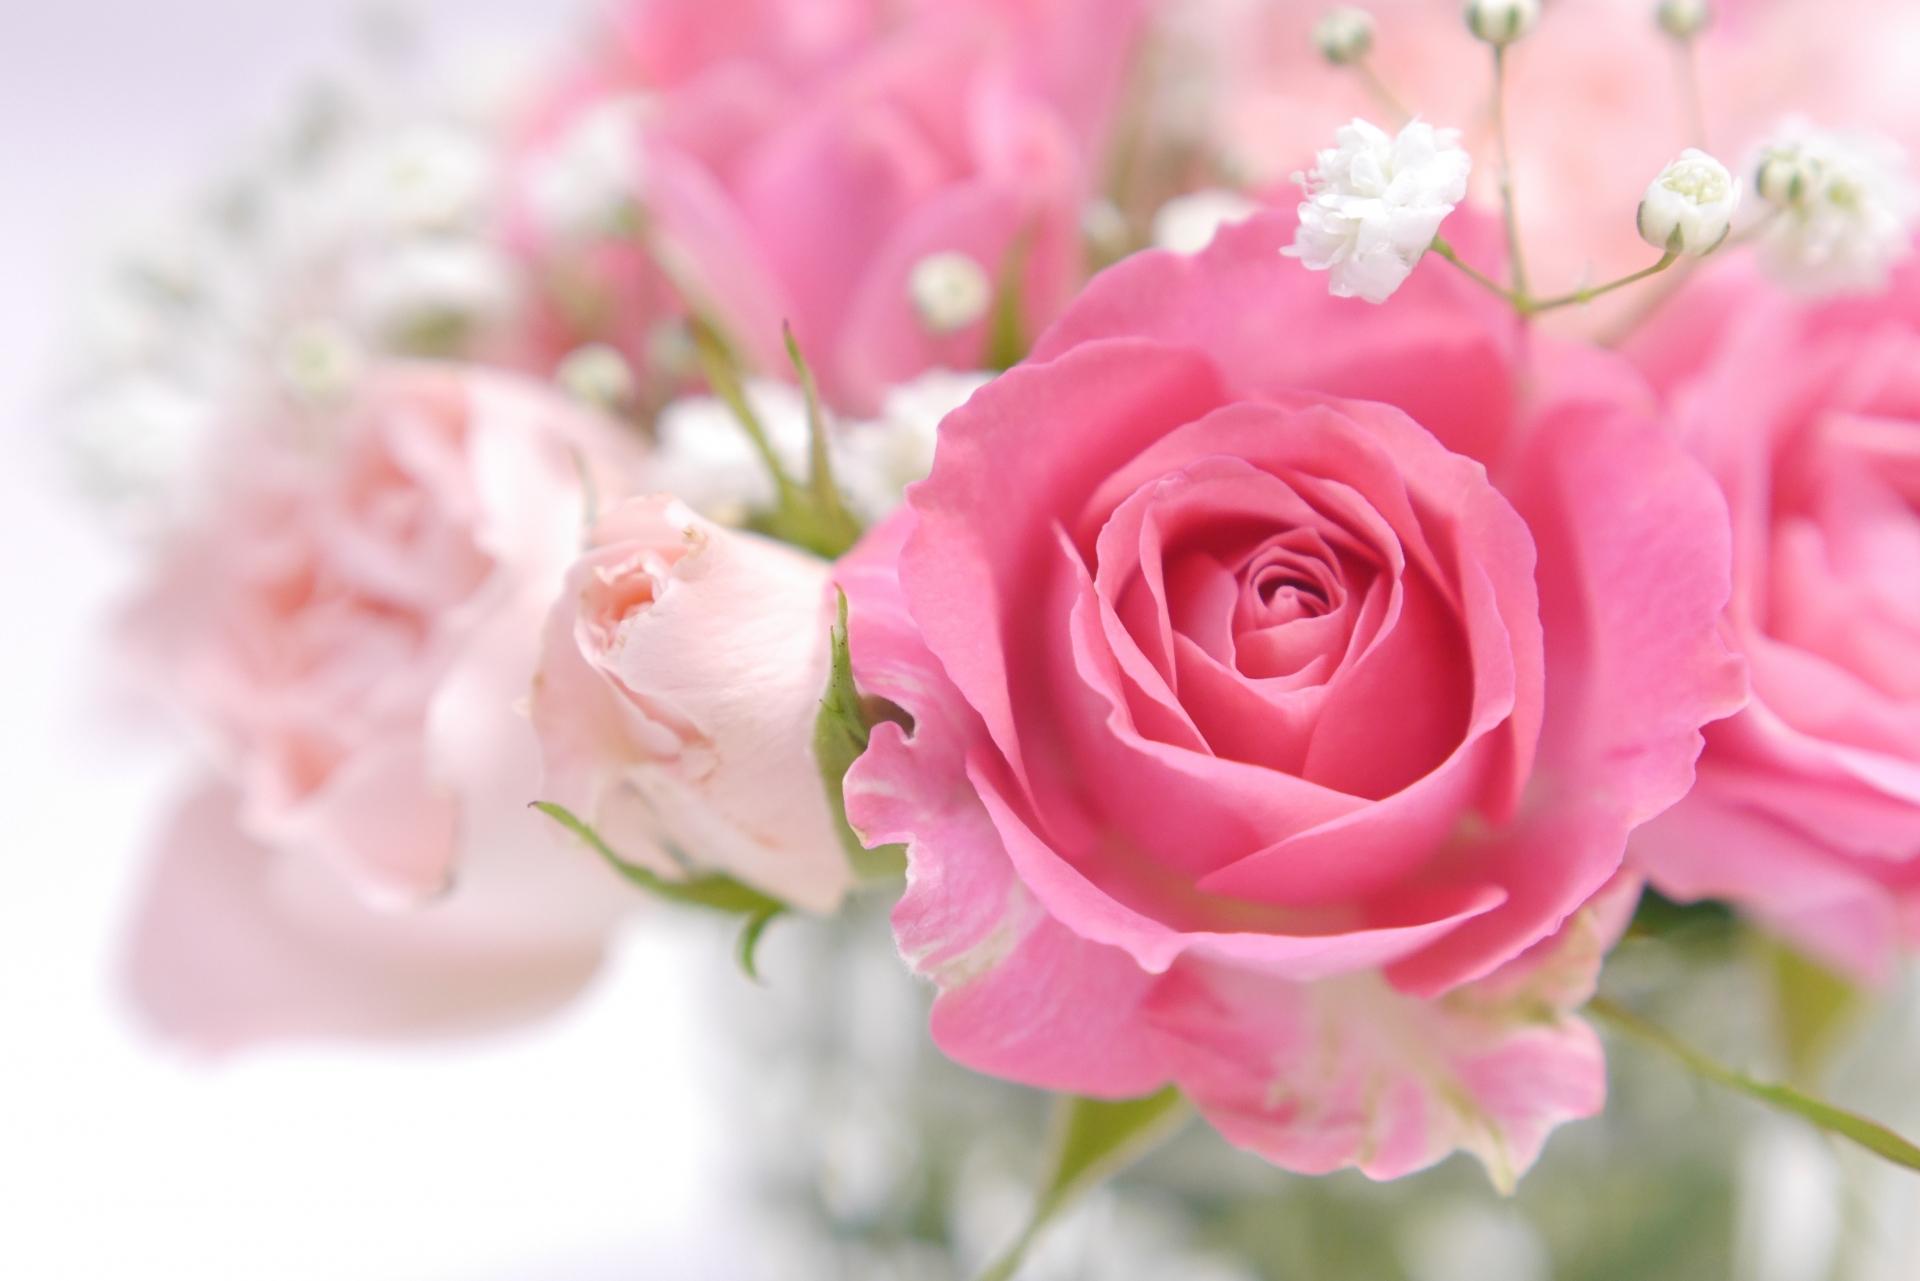 優しい色の薔薇